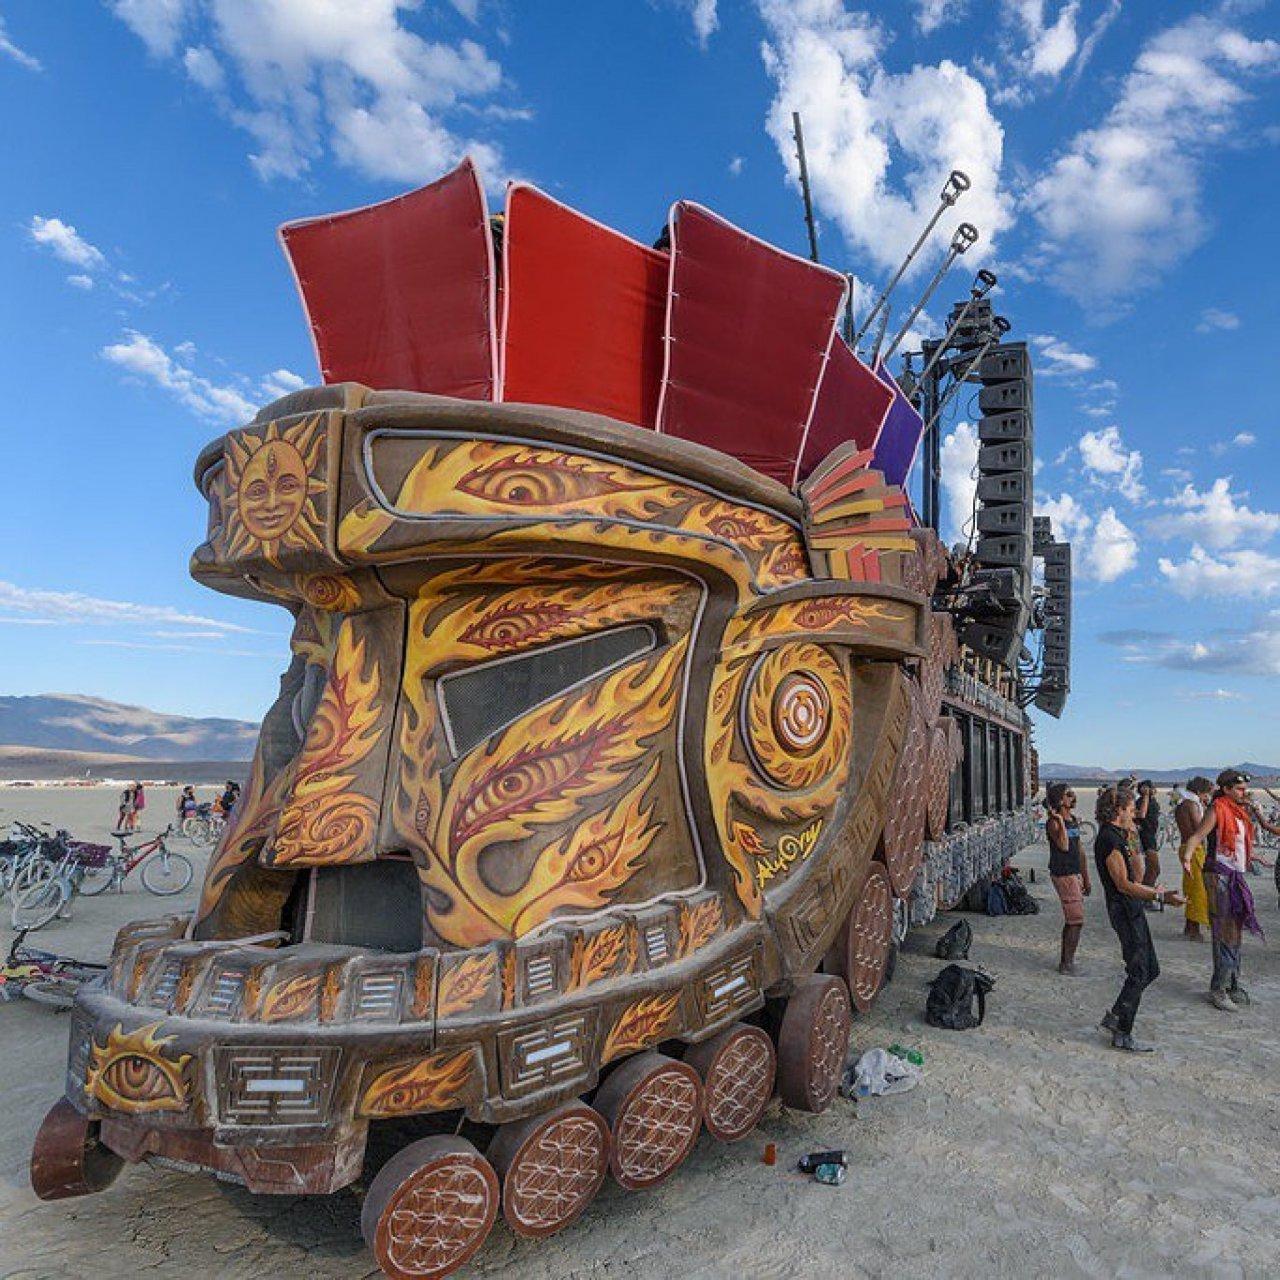 Burning Man, Burning Man rocket car on Sotheby's charity auction docket, ClassicCars.com Journal